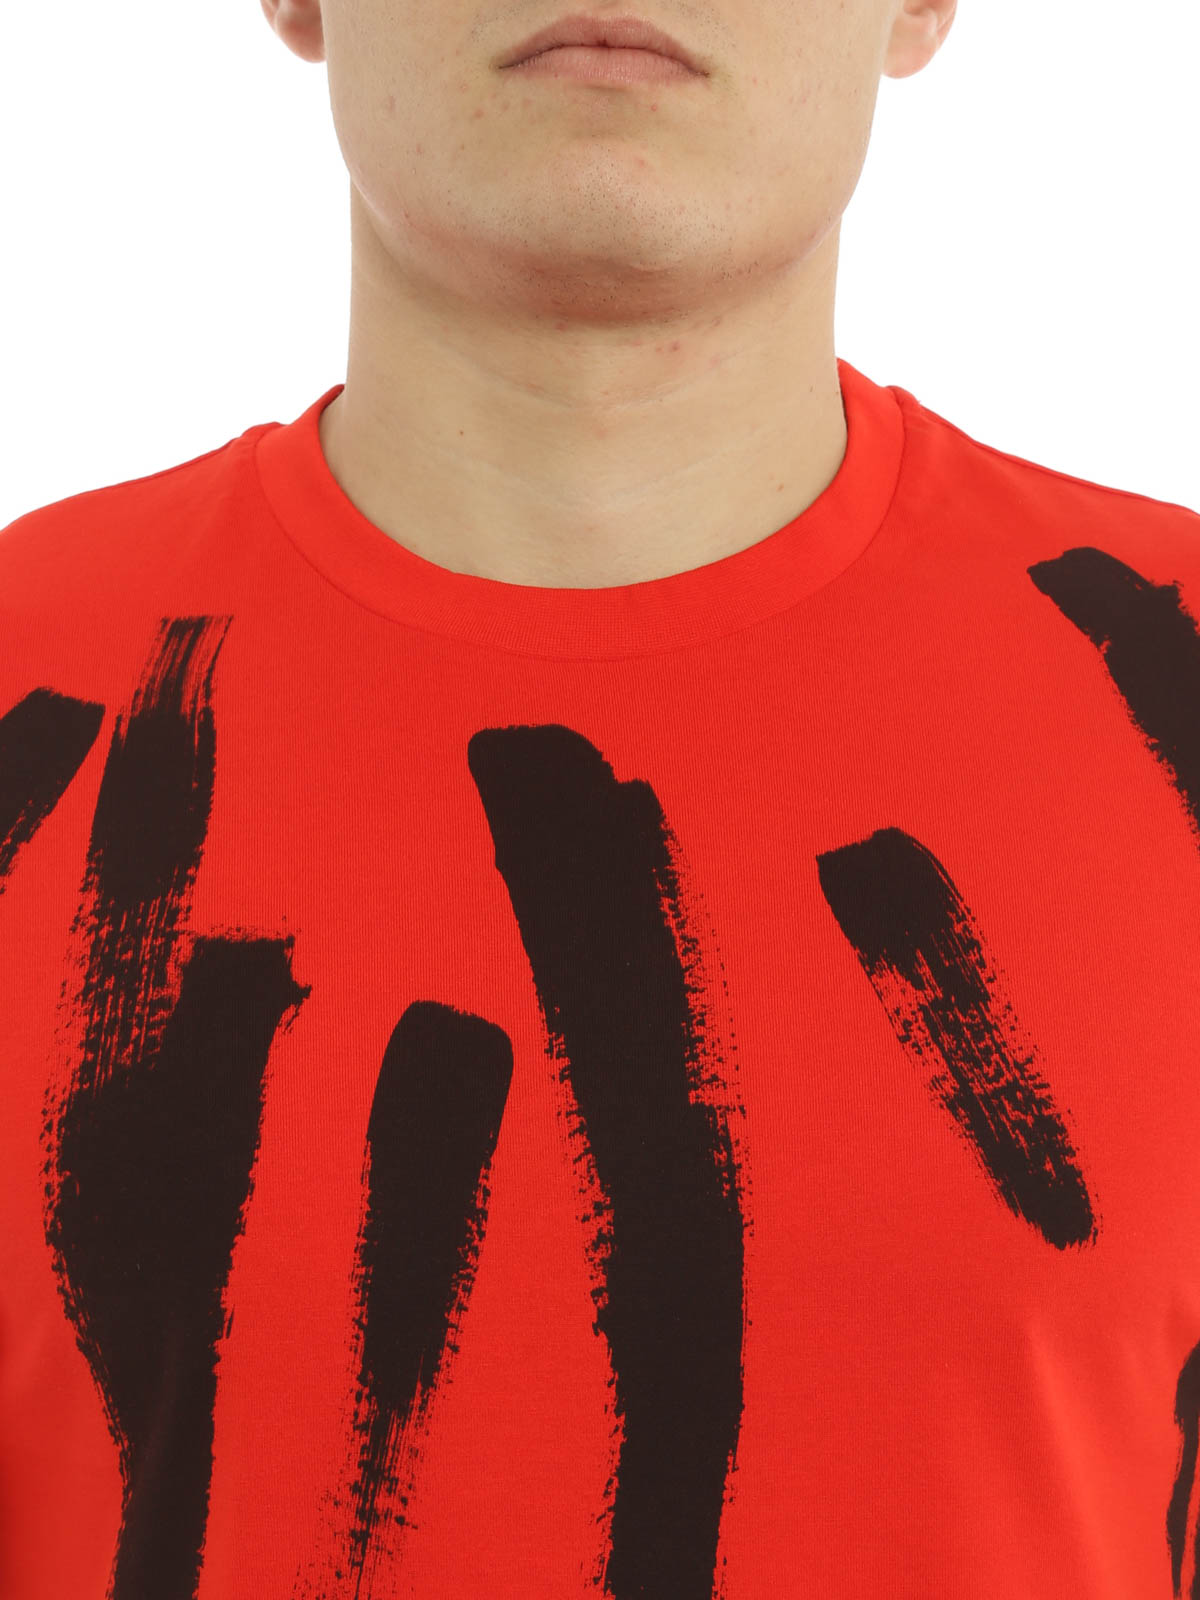 balenciaga t shirt rot